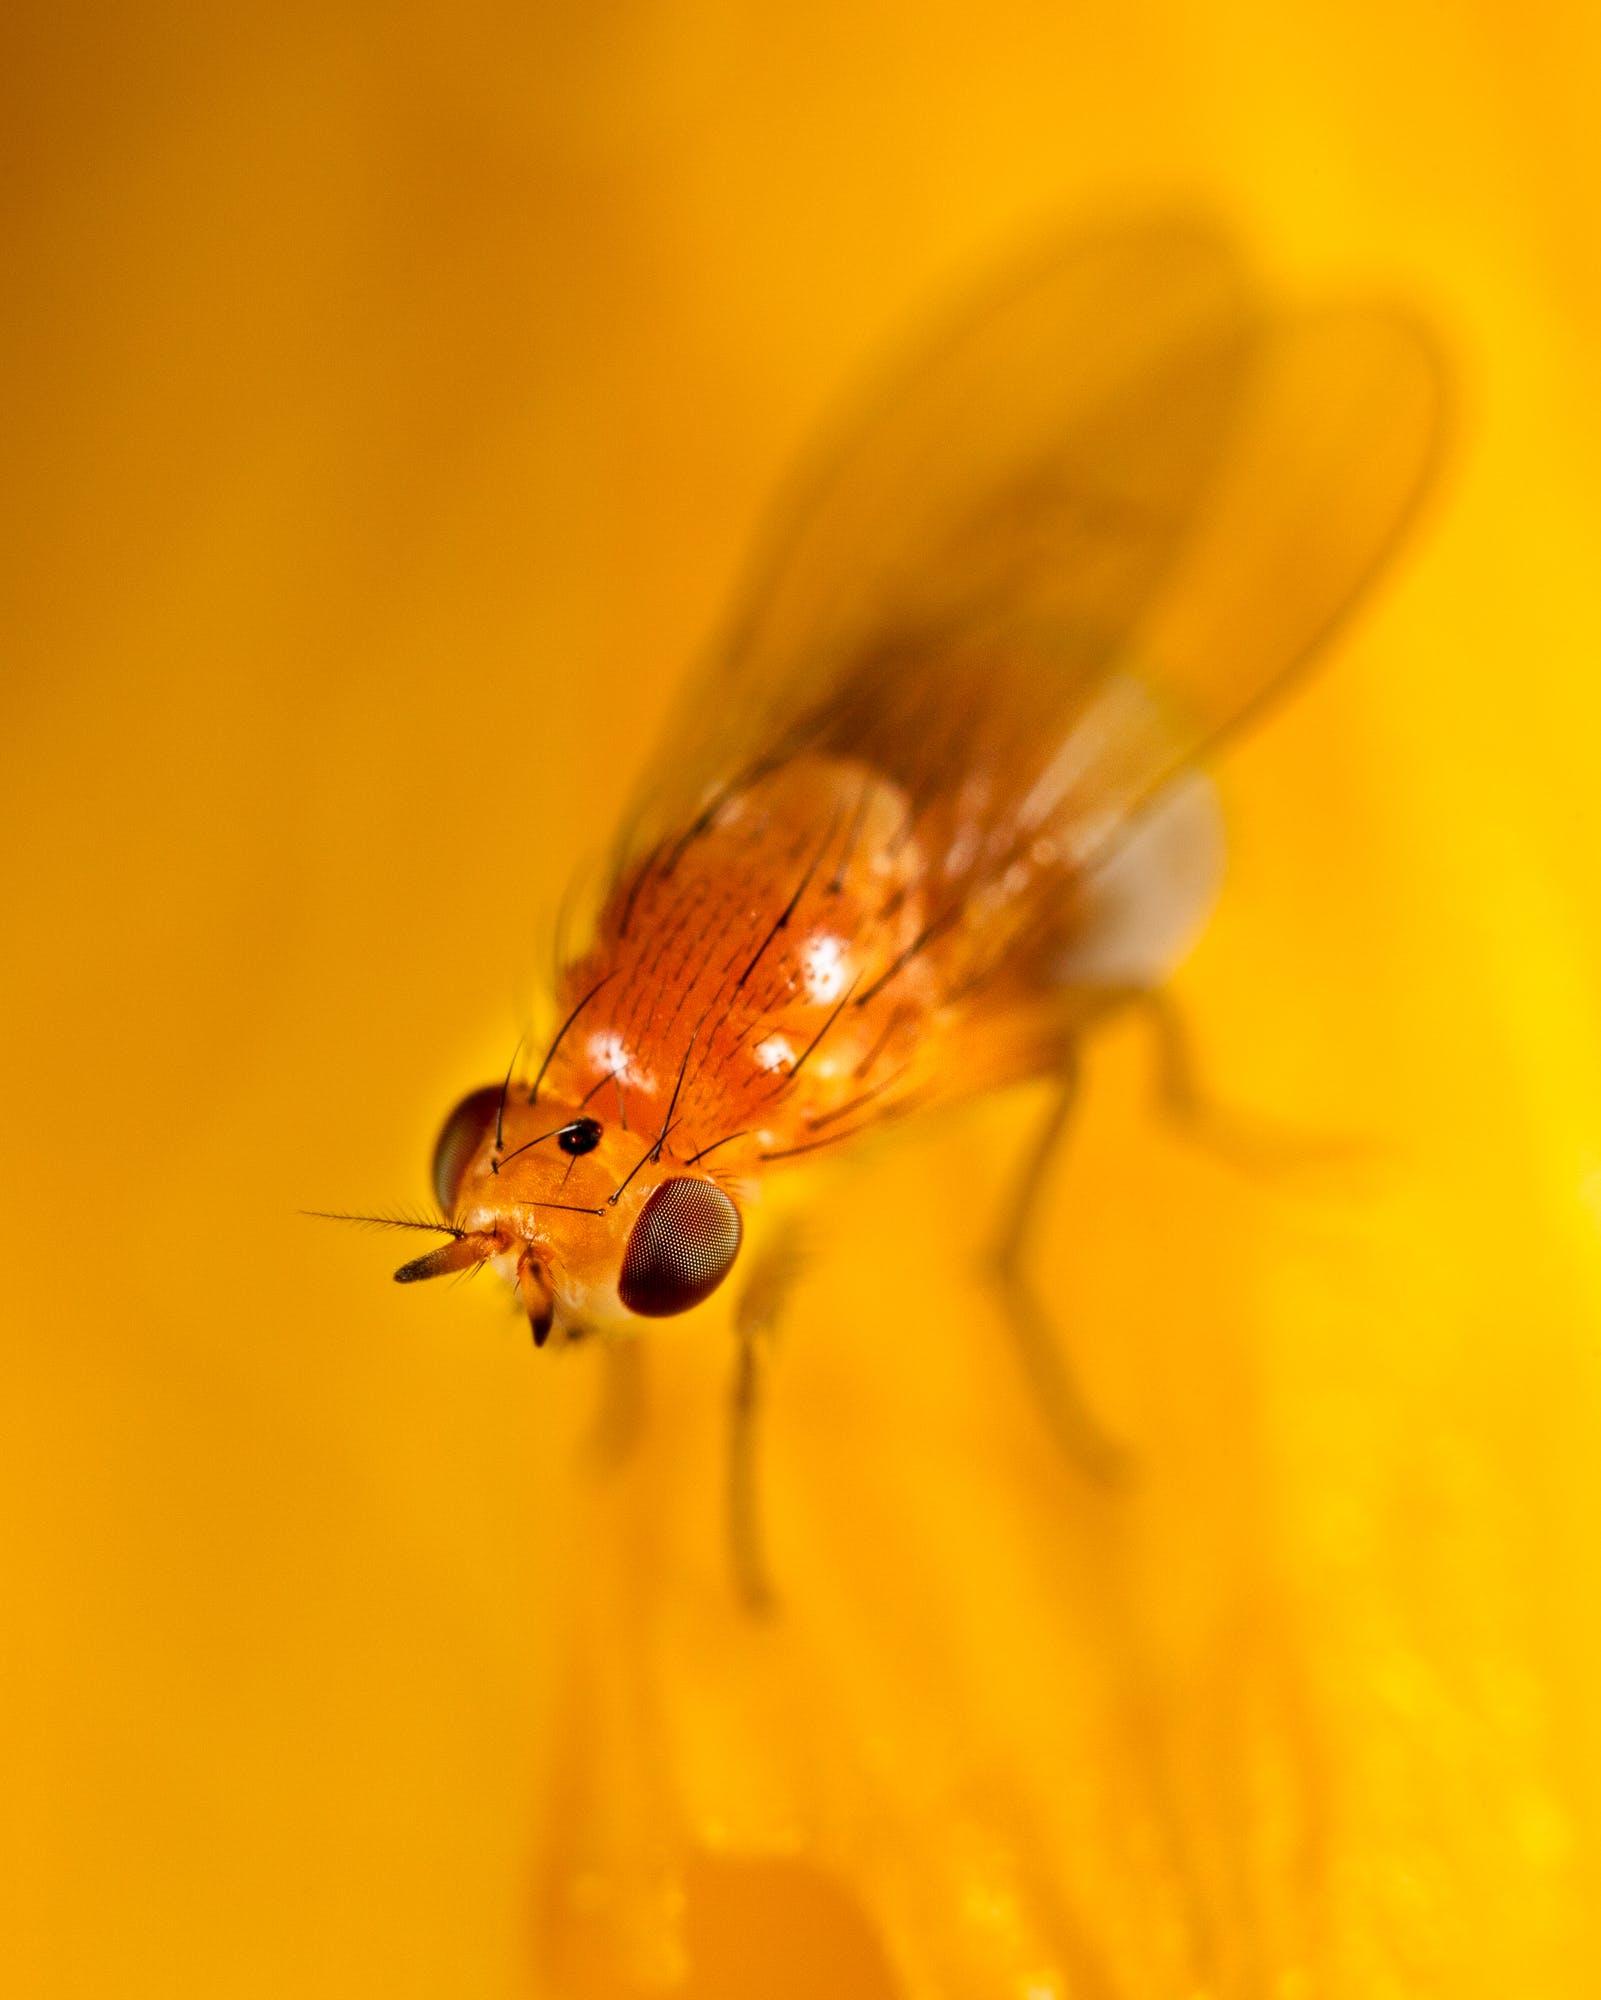 Free stock photo of insect, macro, yellow bug